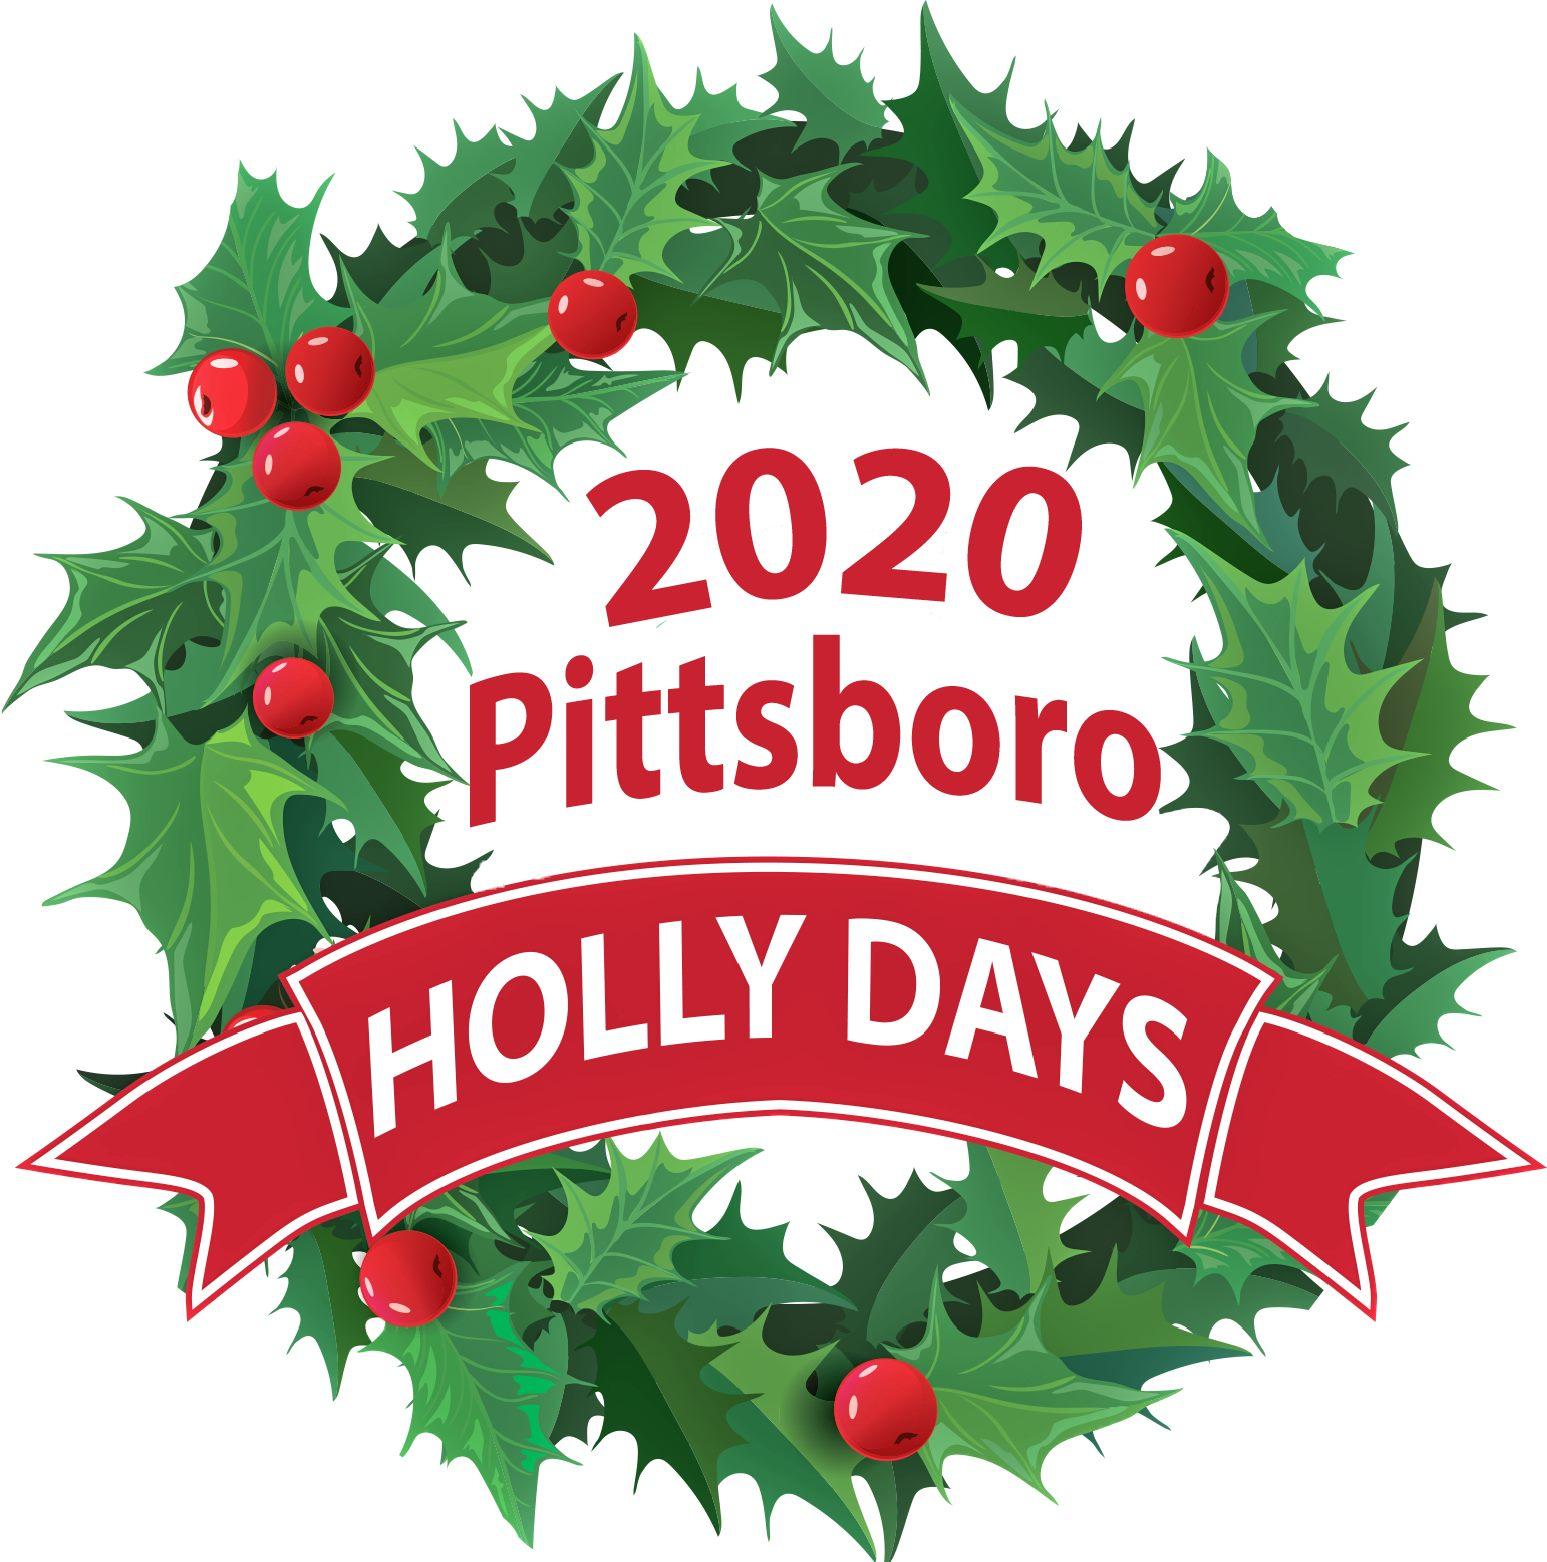 Pittsboro Holly Days 2020